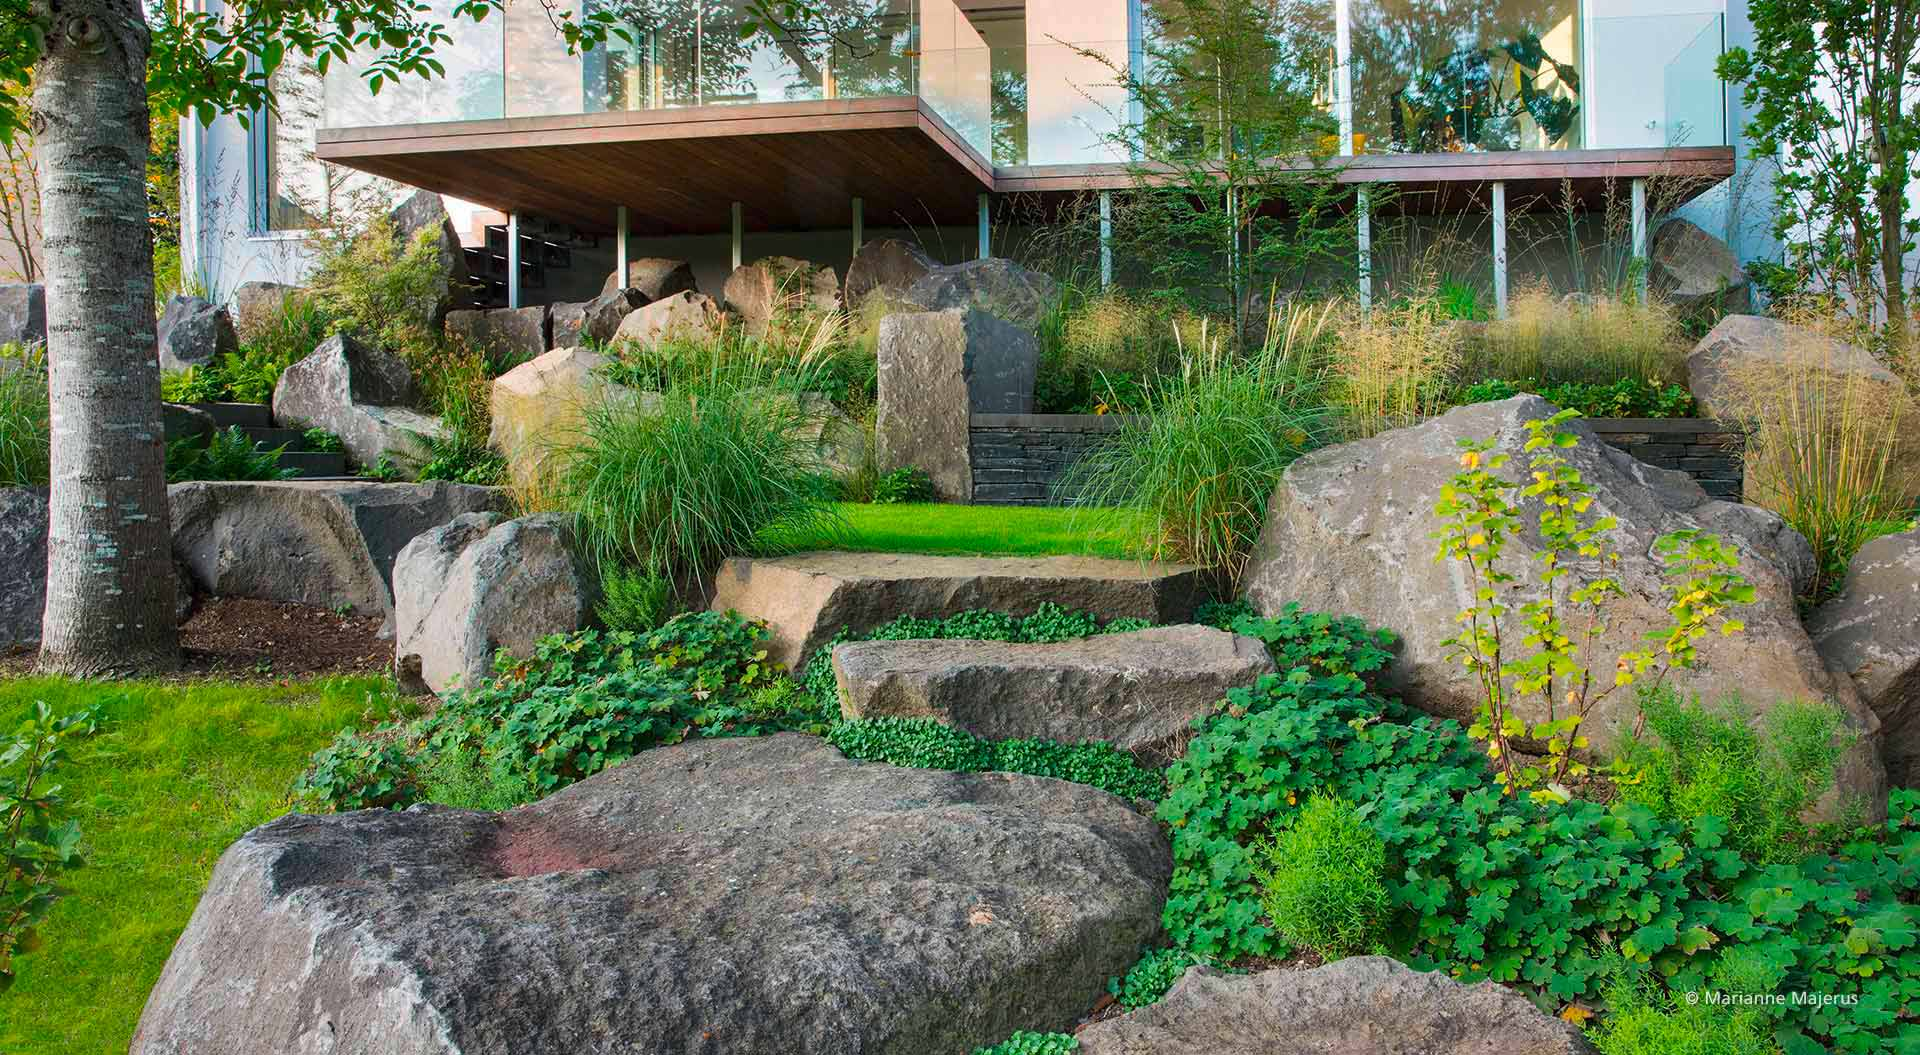 Many plants and stones under a balcony stilt foundation